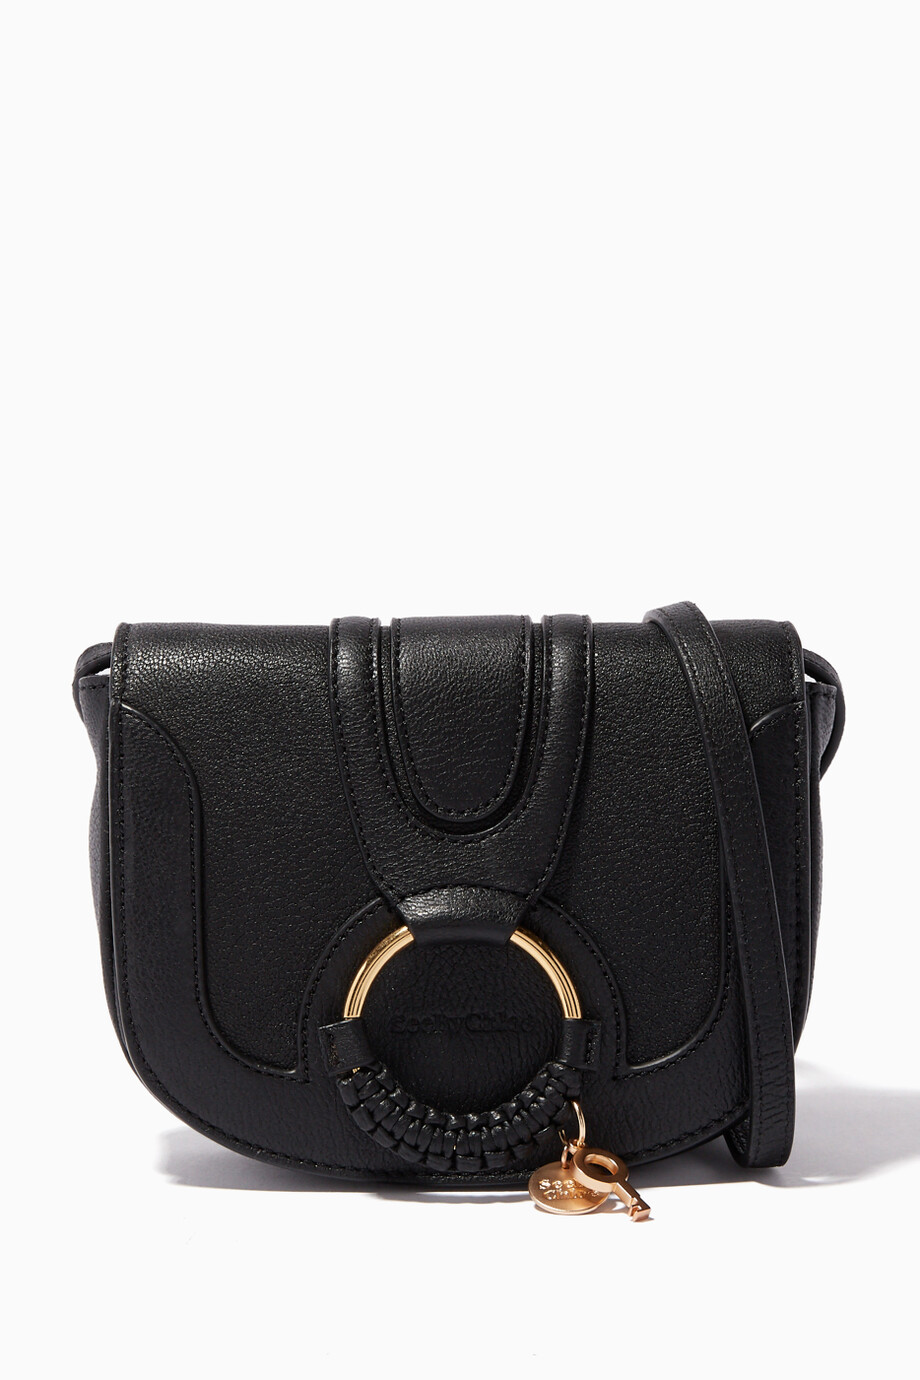 769a3a9e408 Shop See By Chloé Black Black Small Hana Shoulder Bag for Women ...